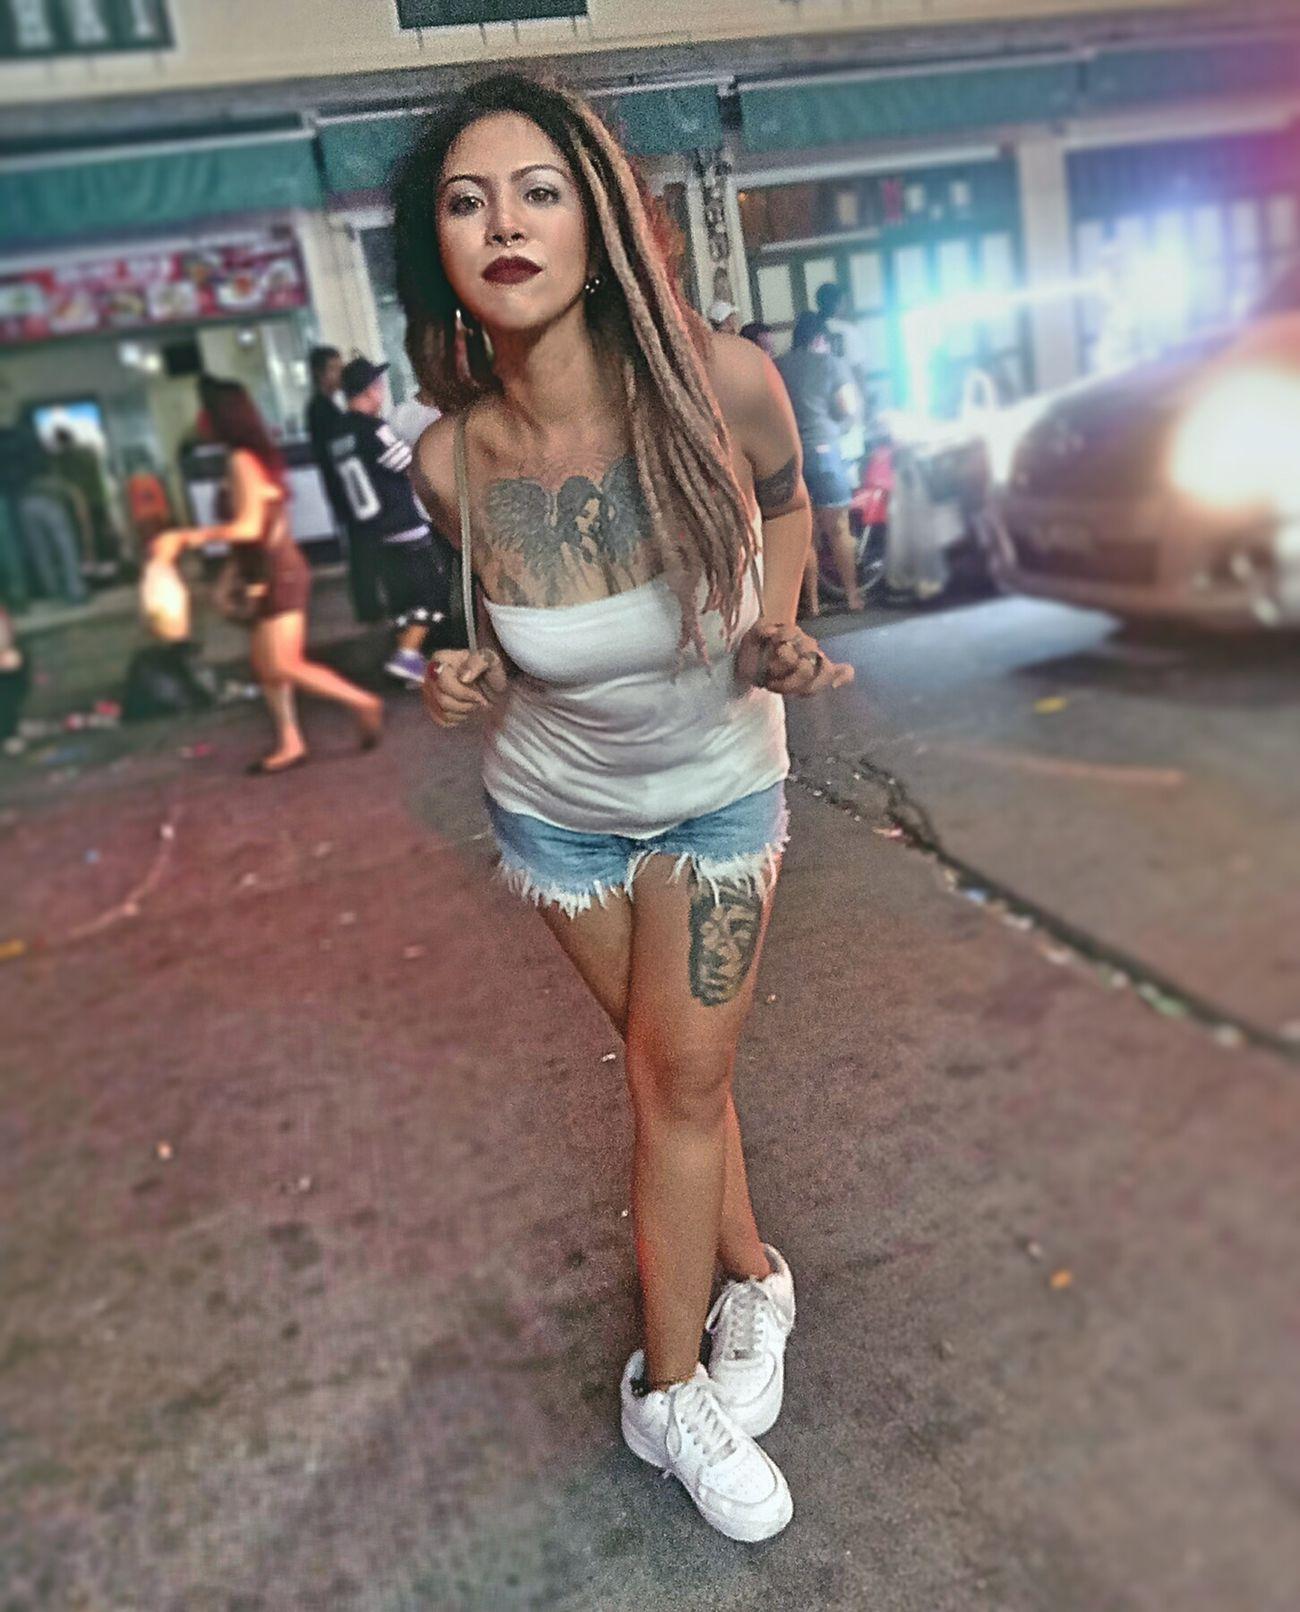 Hey guys... 😊😘 Women Beautiful People Looking At Camera Beauty Enjoying Life Thaigirls Thailand Asian Girl Hello World ThatsMe Chill Fun First Eyeem Photo Beautiful People Sexyasiangirl Dreadlocks Girl Girlwithtattoos  Crazygirl Mypic Dreadlocks Tattoos Lifestyles Party Aliennam 👽👽👽